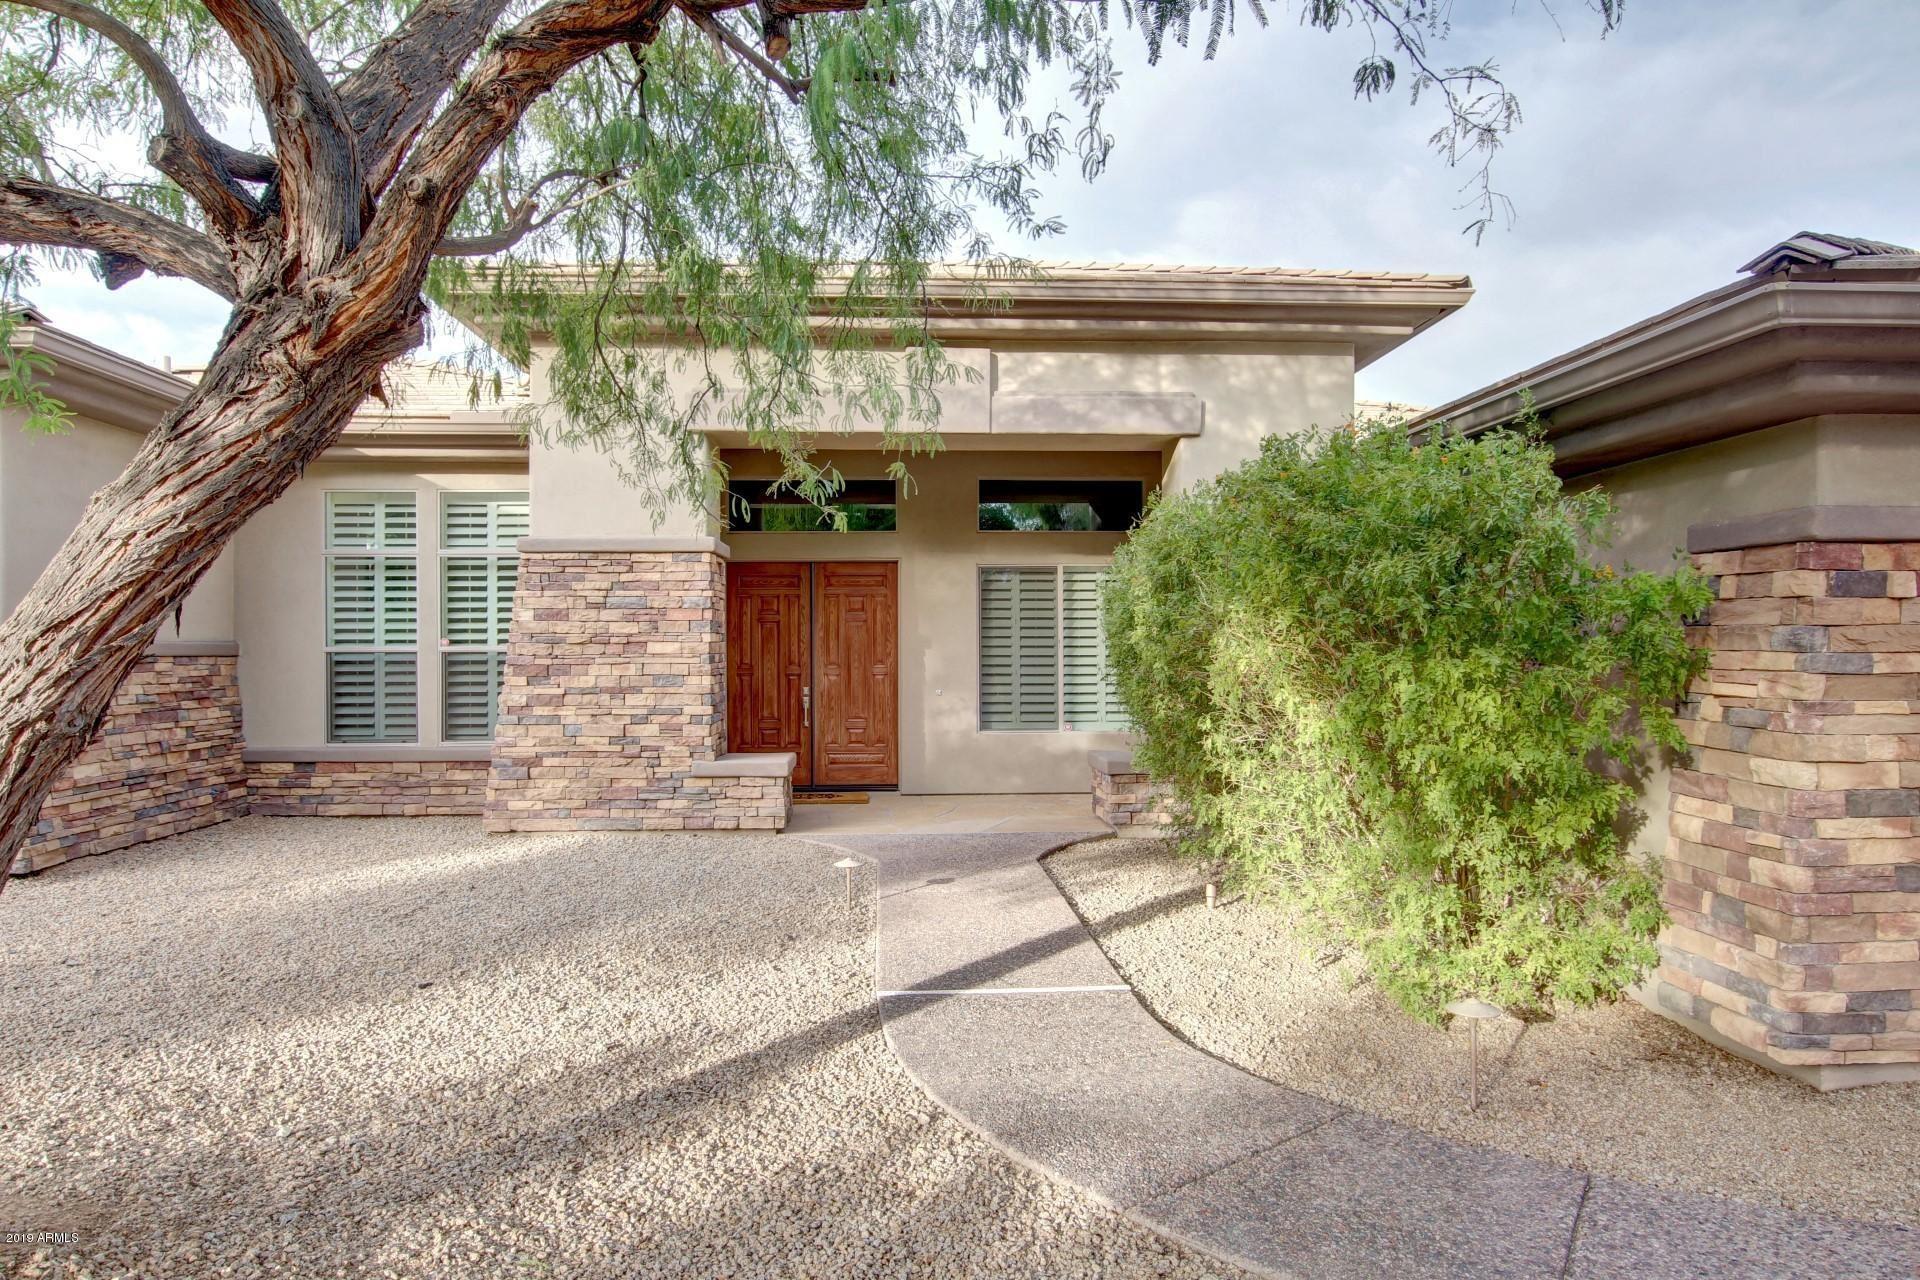 10042 N 37TH Street, Phoenix, AZ 85028 - MLS#: 6143038